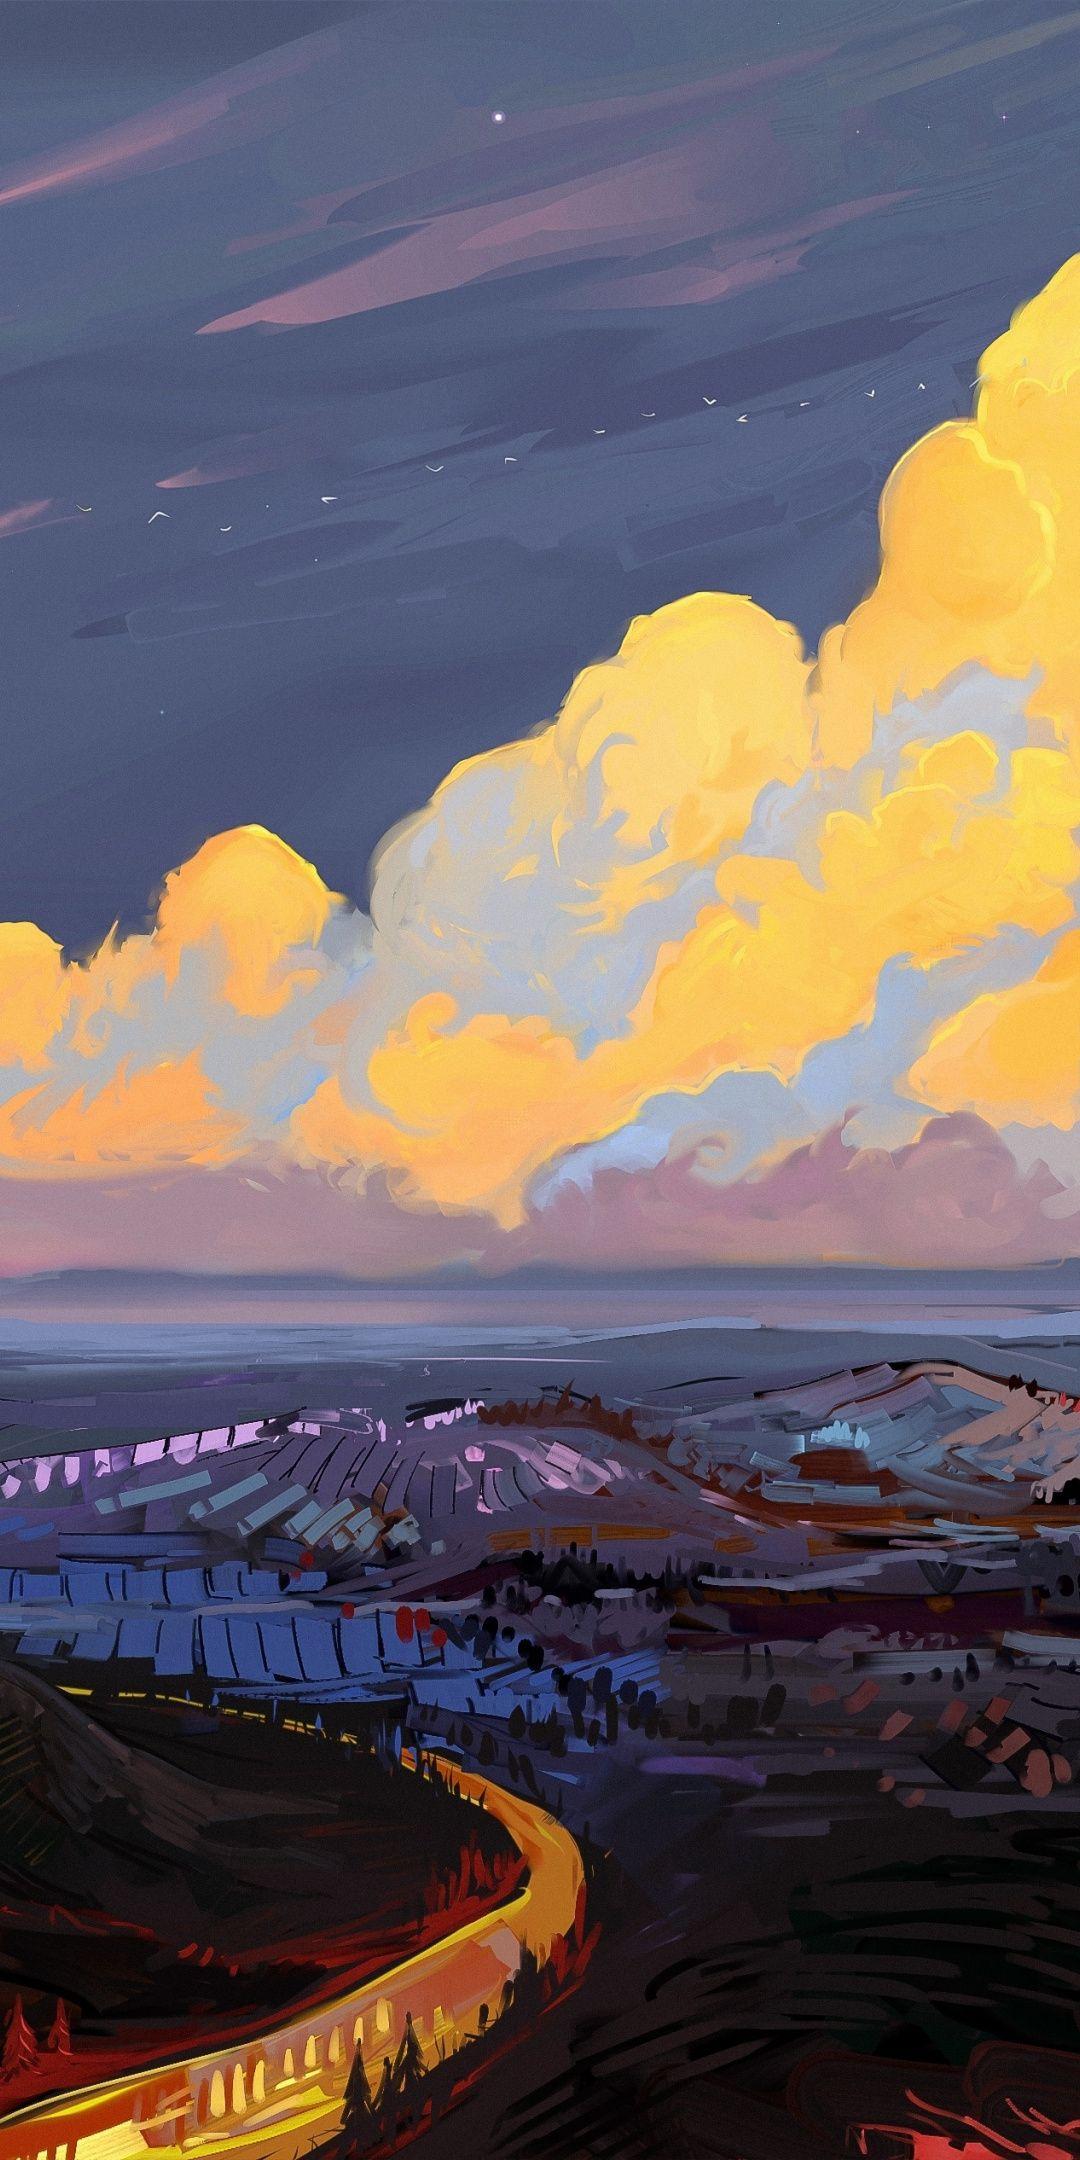 Artwork, clouds, landscape, 1080x2160 wallpaper